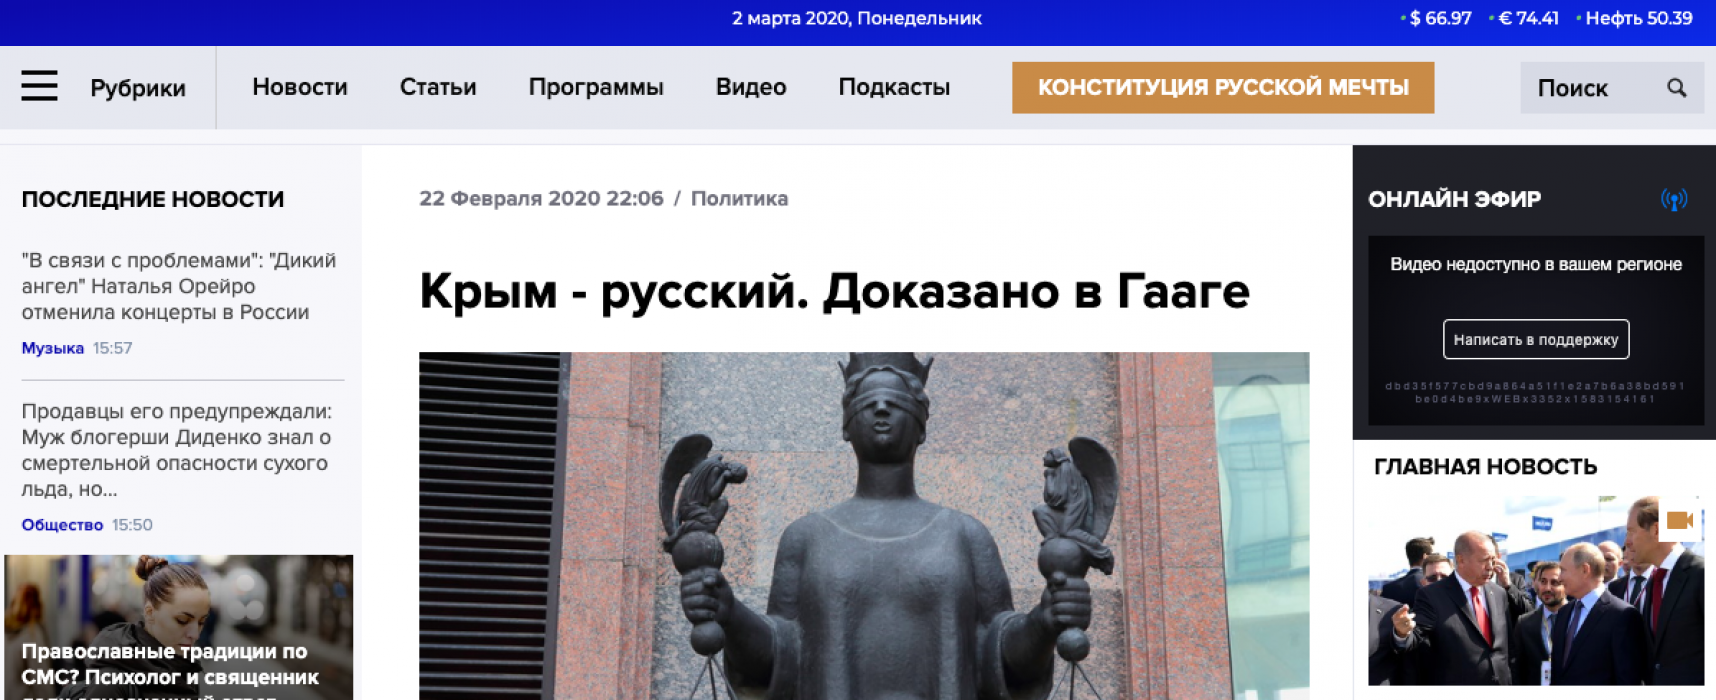 Falso: La Haya ha reconocido a Crimea como parte del territorio de Rusia